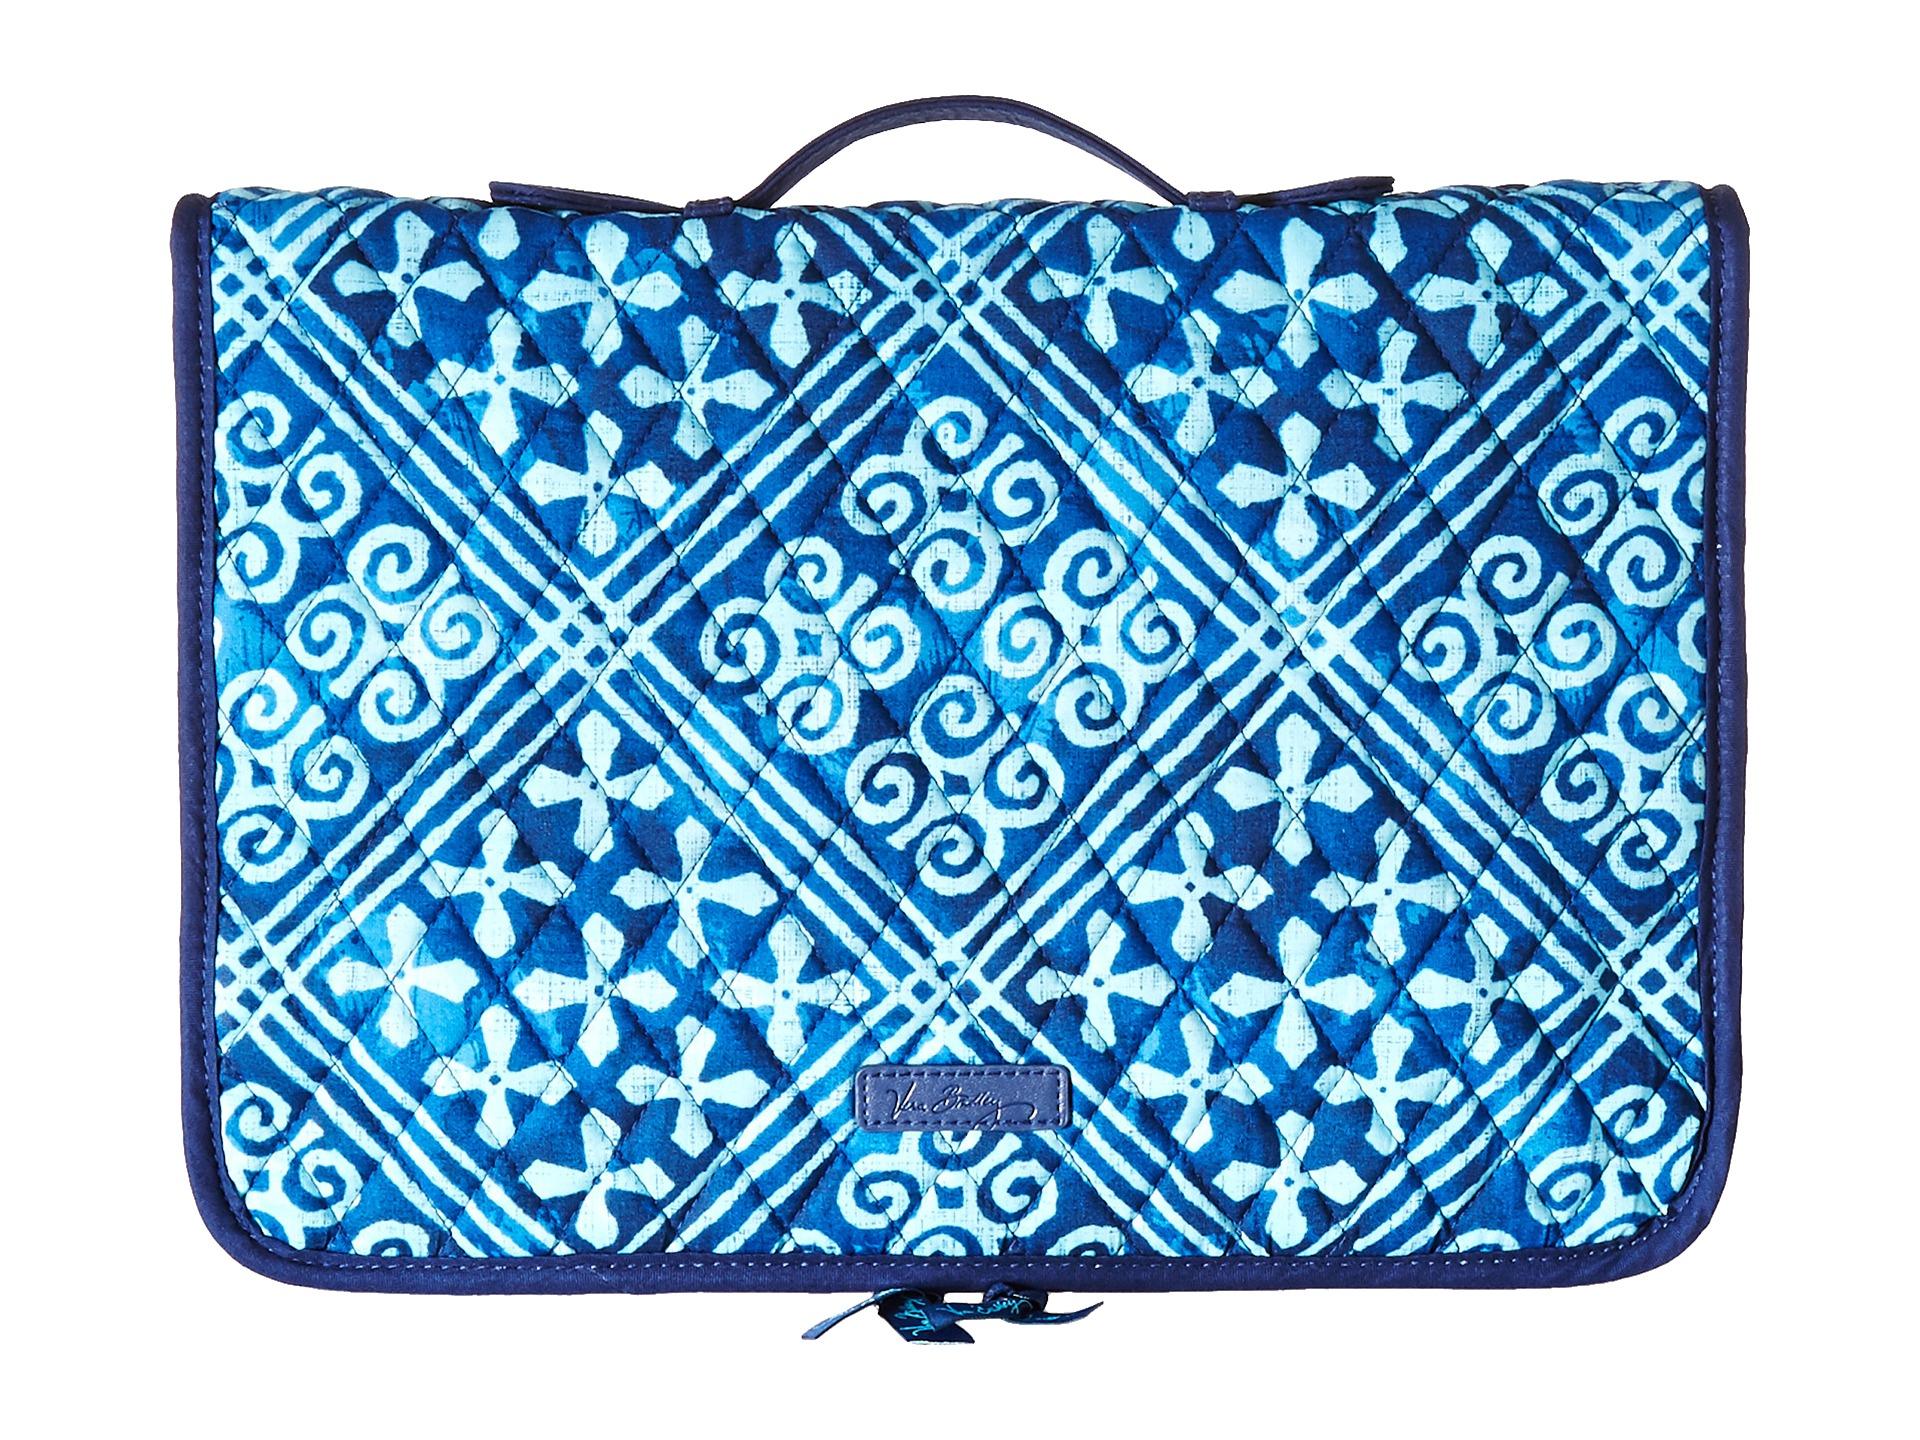 vera bradley luggage ultimate jewelry organizer at zappos